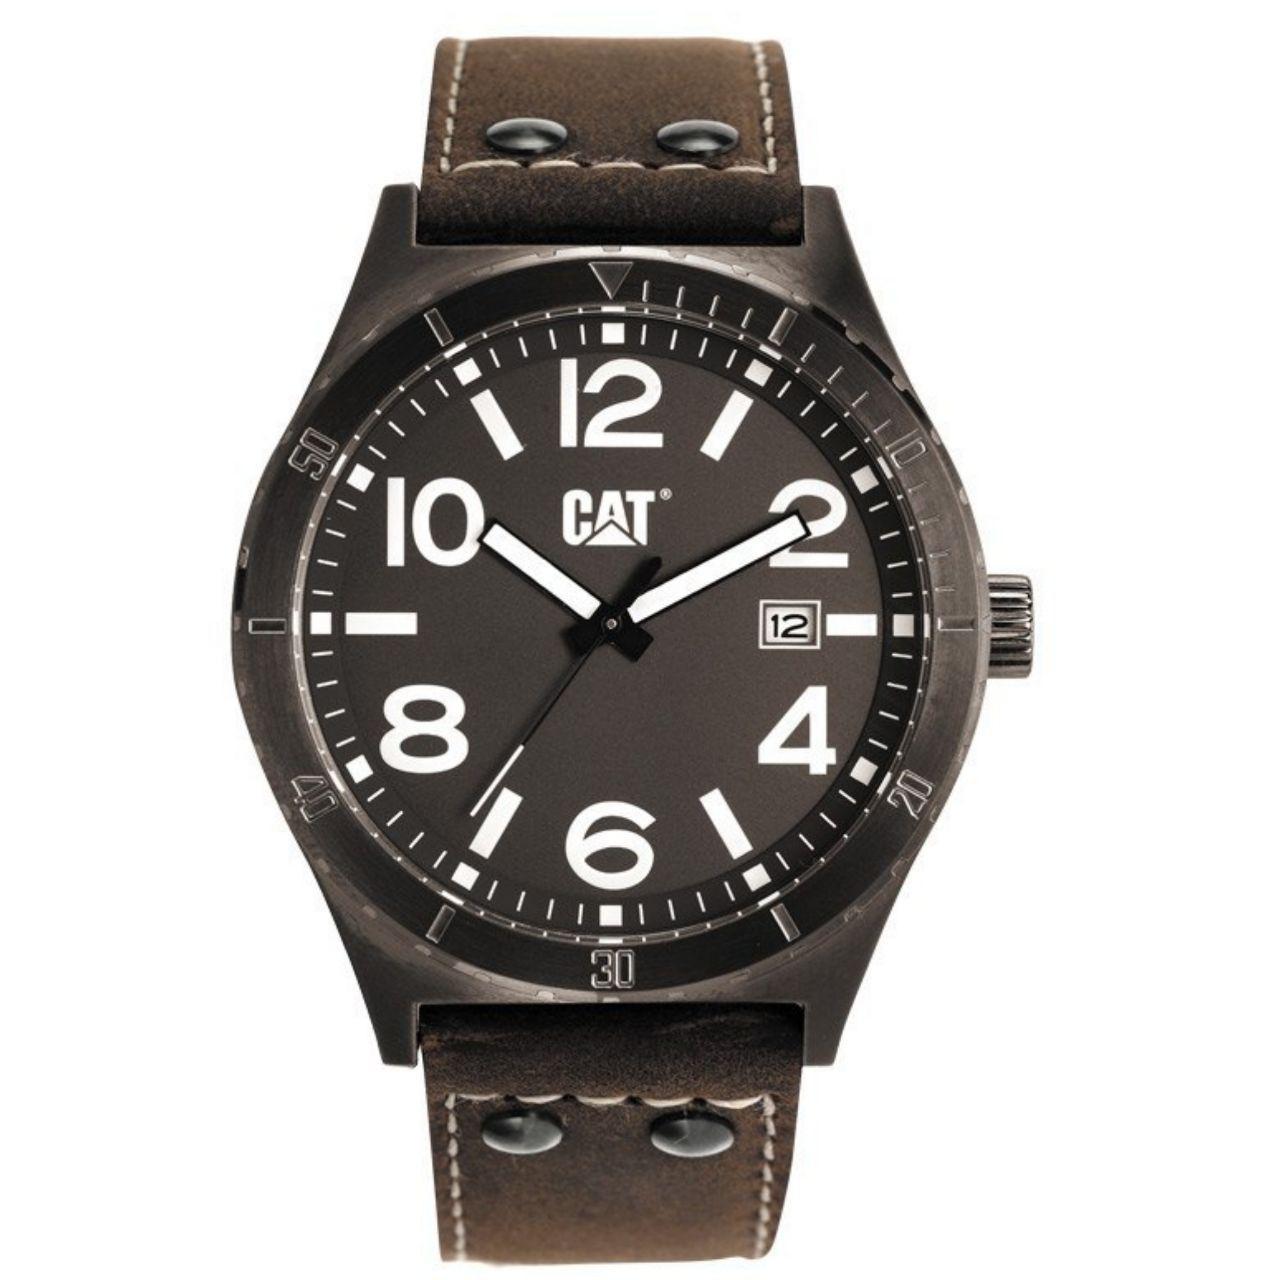 ساعت مچی عقربه ای مردانه کاترپیلار مدل NI.251.35.535